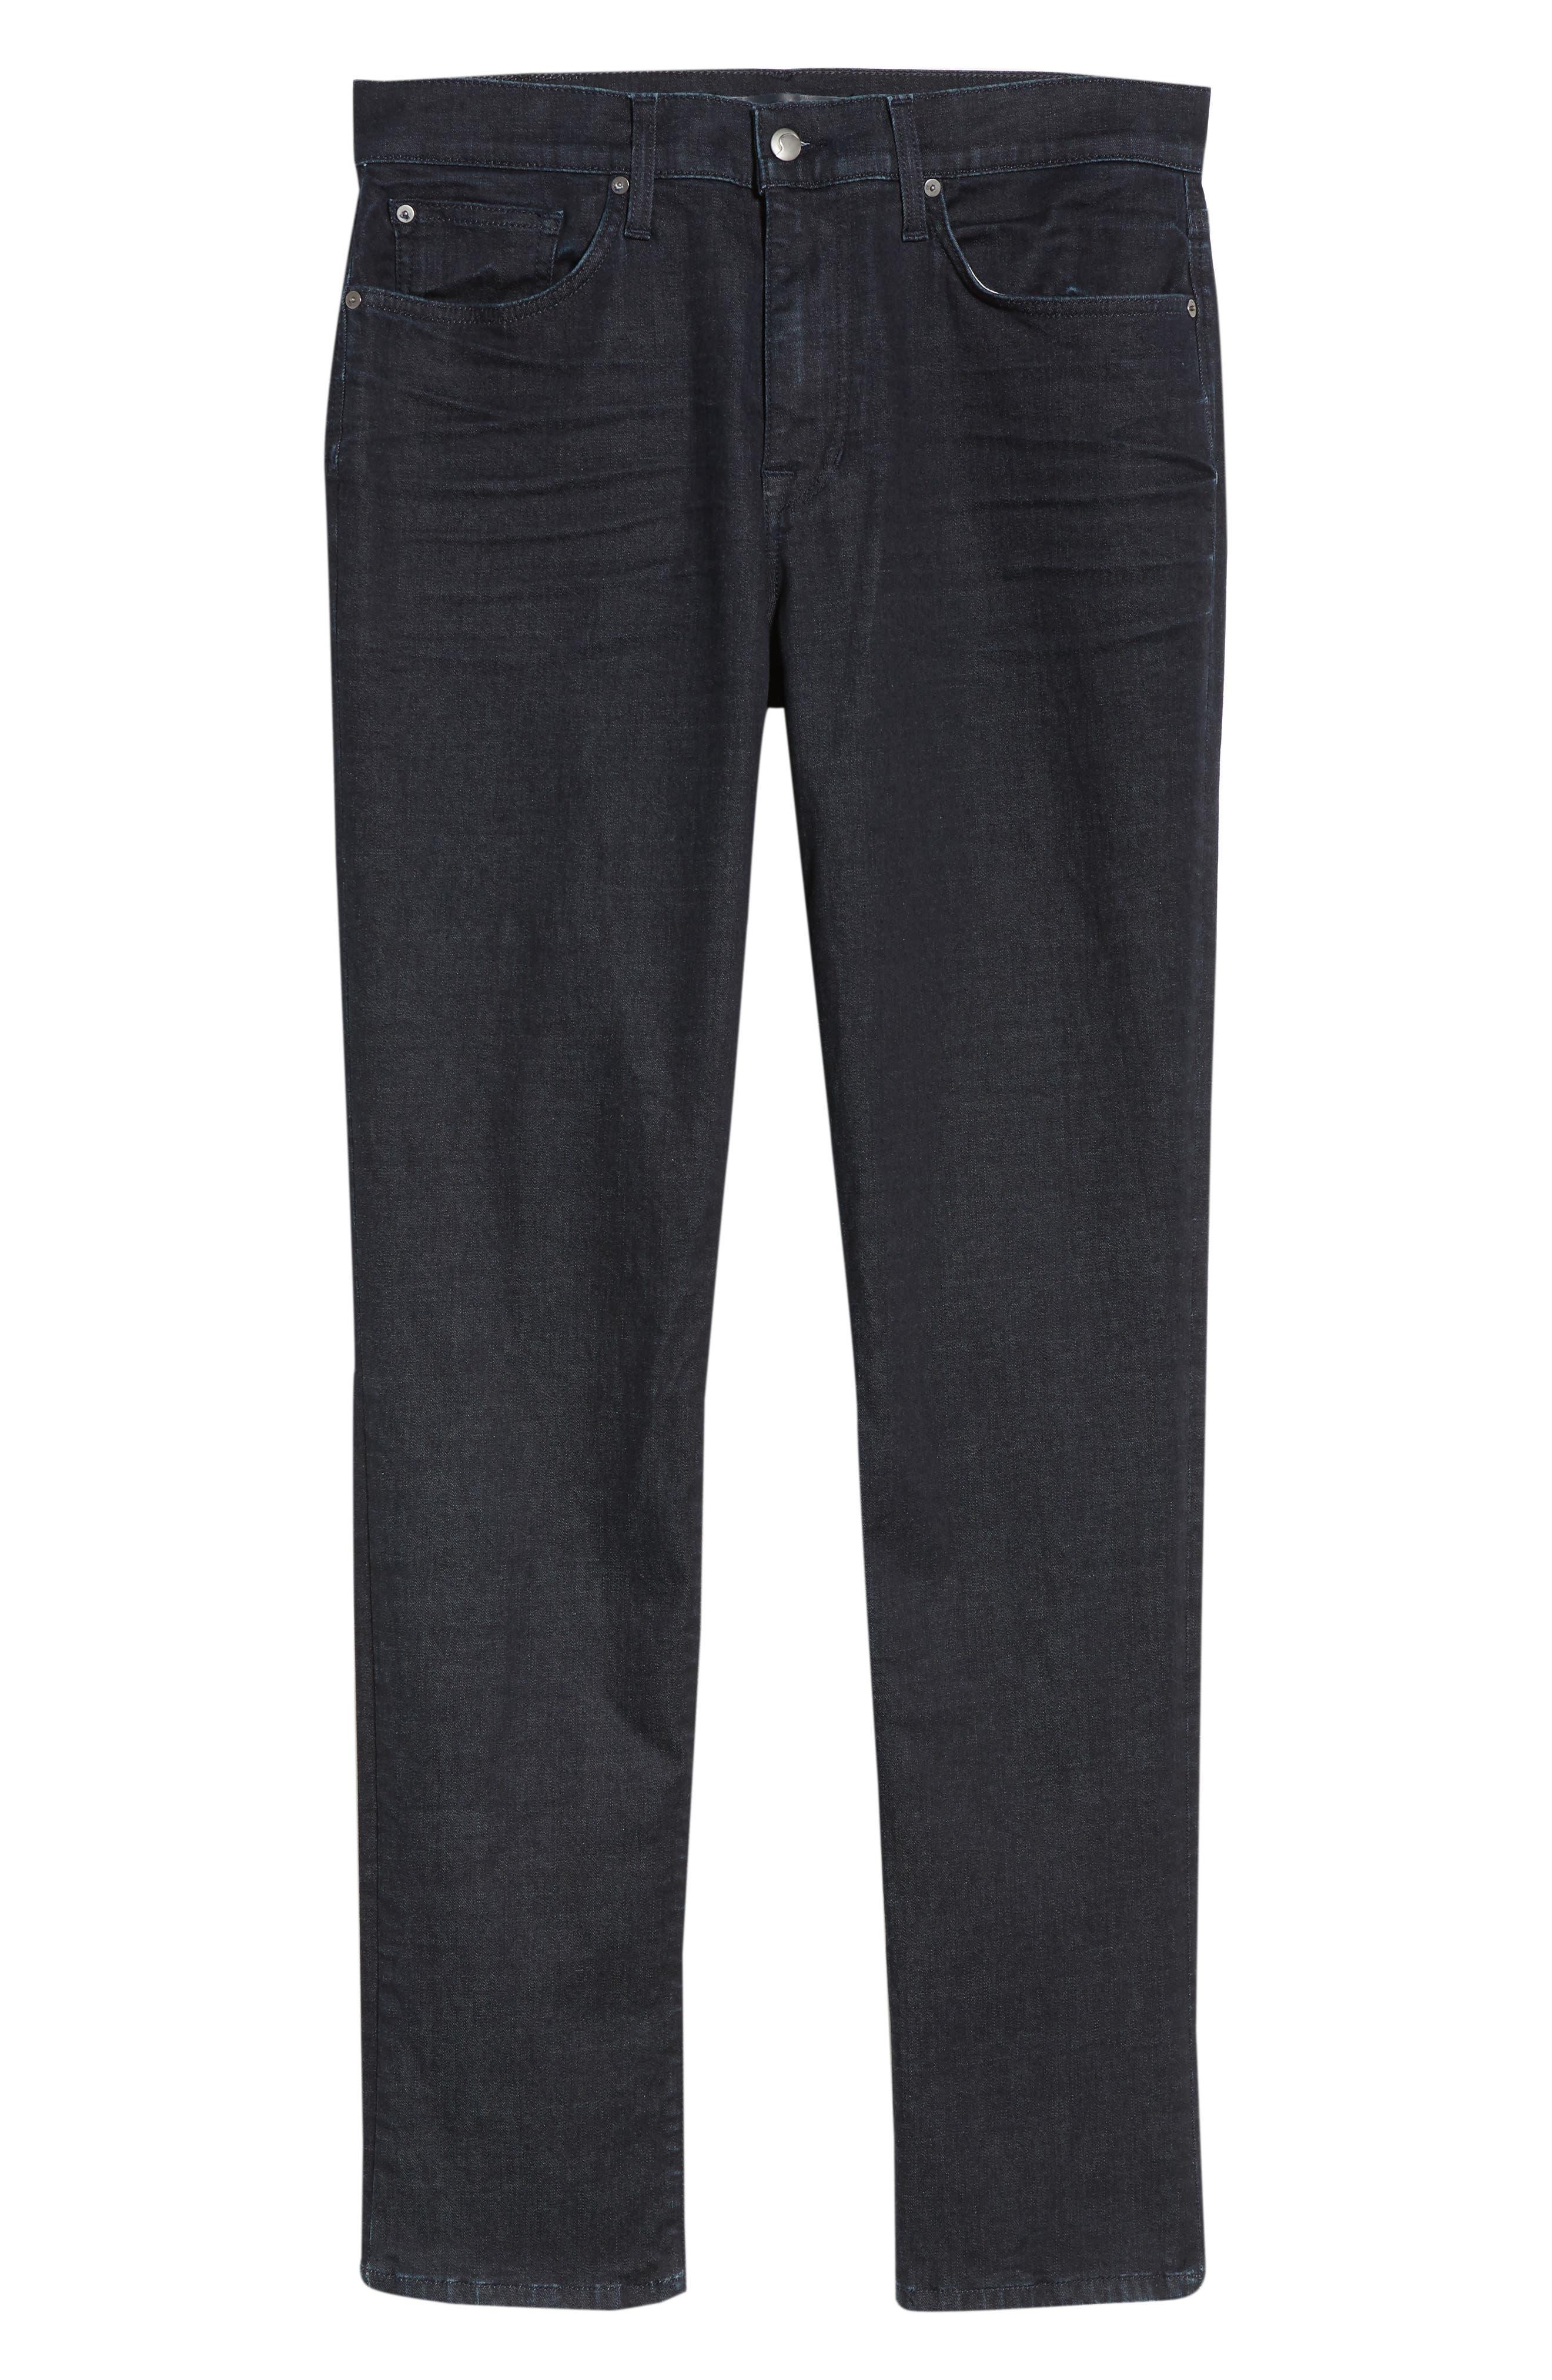 Folsom Slim Fit Jeans,                             Alternate thumbnail 6, color,                             DOM